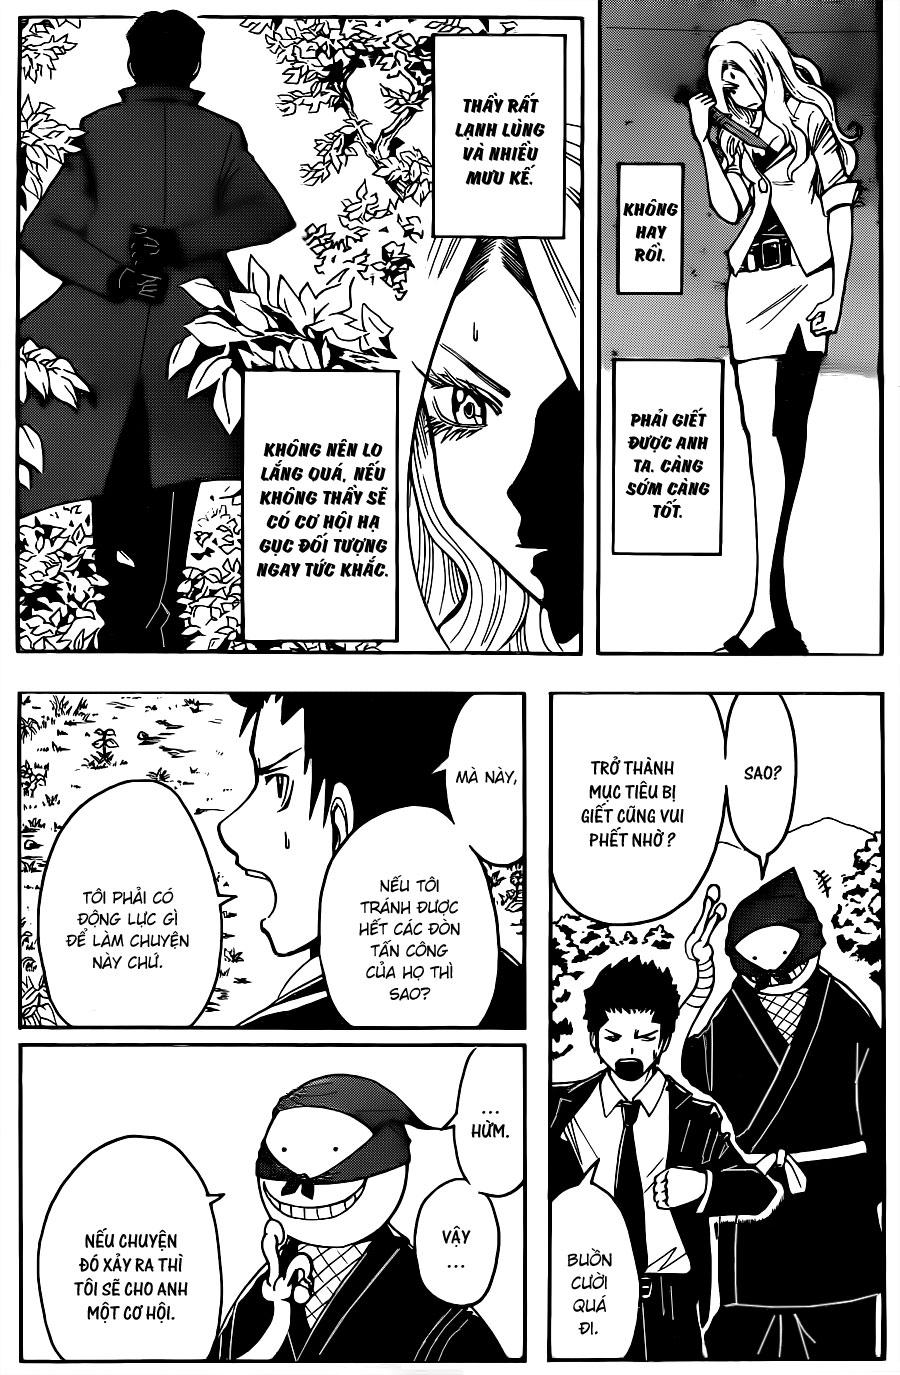 Ansatsu Kyoushitsu chap 26 trang 11